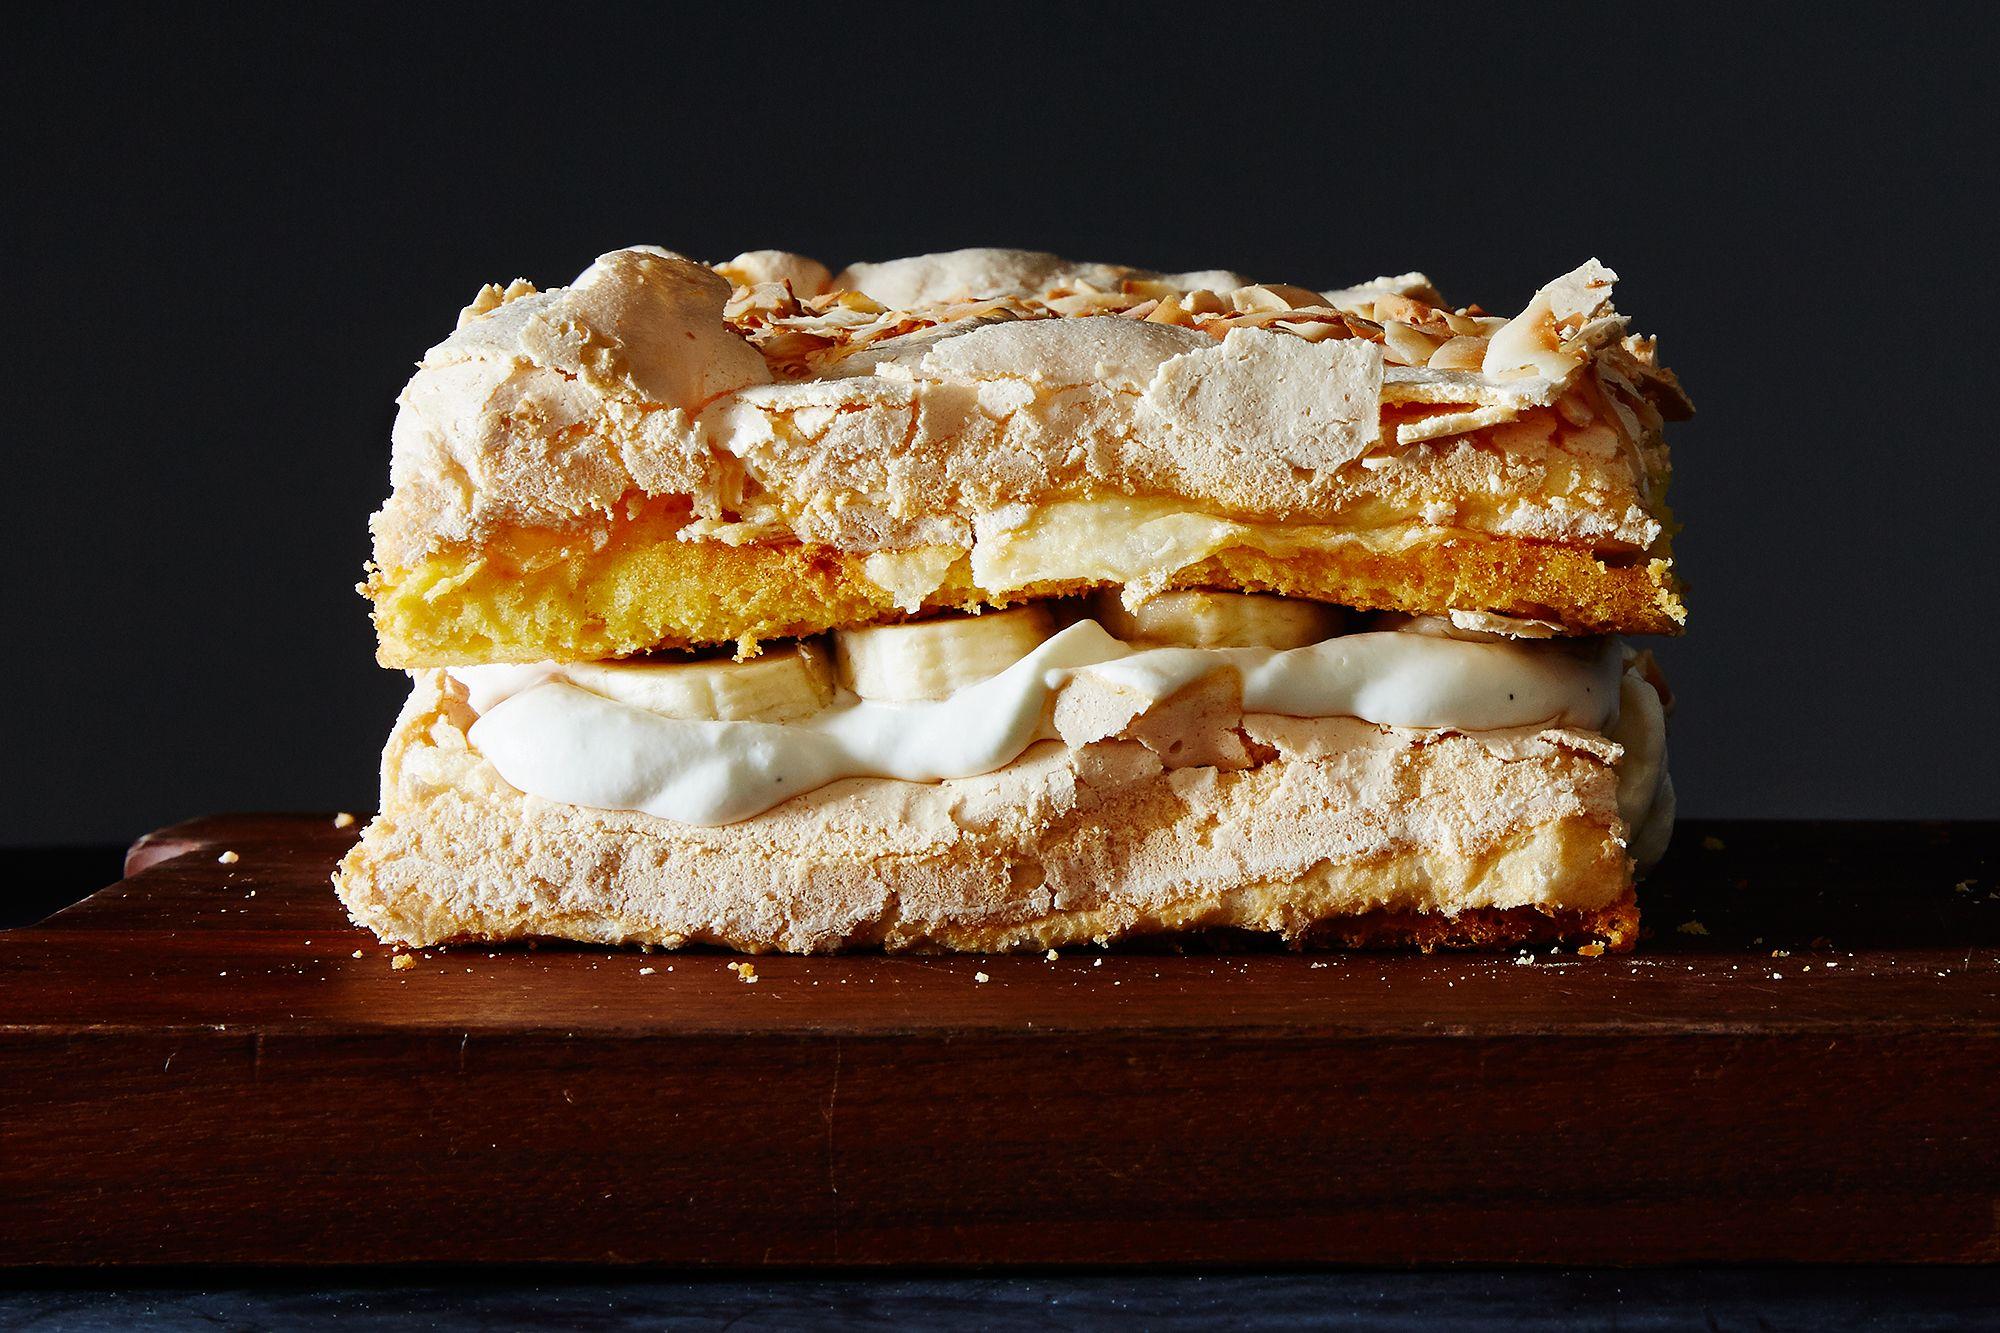 World Best Cake Images Hd : Recept: najbolj?a bananina torta s kokosom na svetu ...